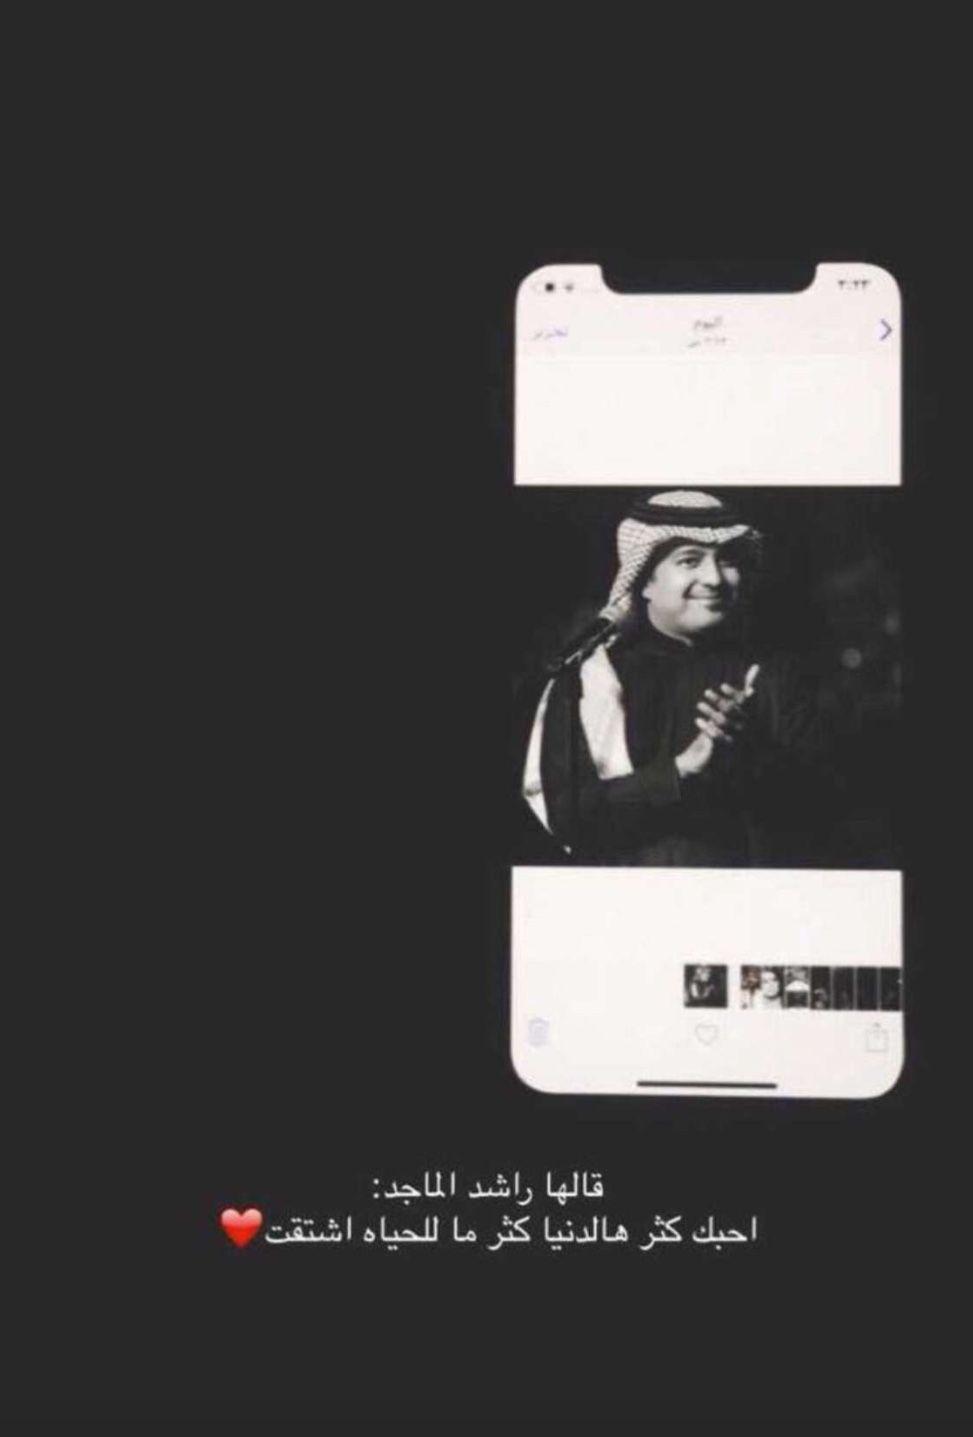 Pin By Esraa Awamleh On Esraa Mixed Feelings Quotes Feelings Quotes Mixed Feelings